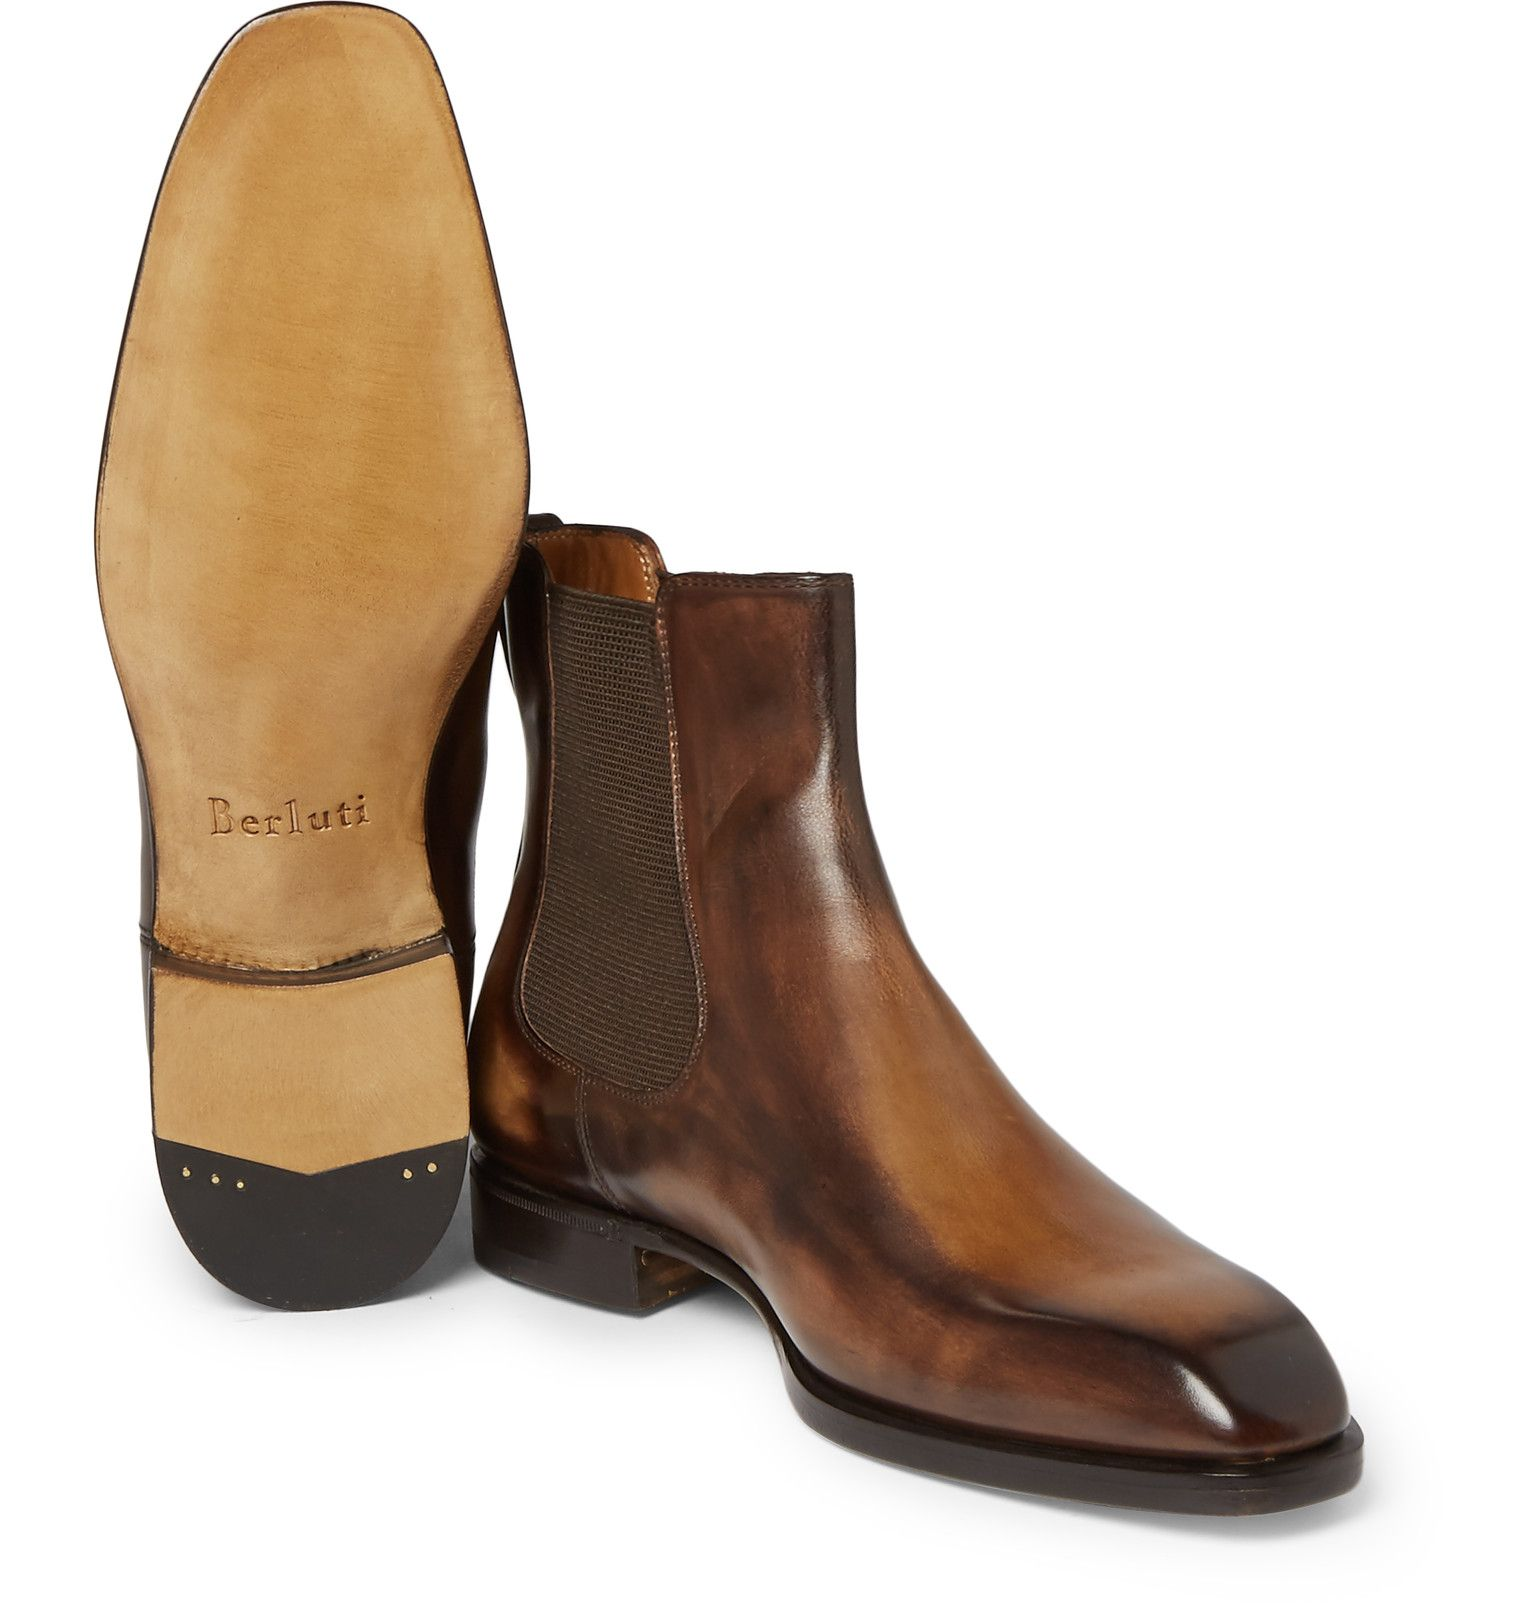 Leather Chelsea Boots - Dark brownBerluti LKoHV8d